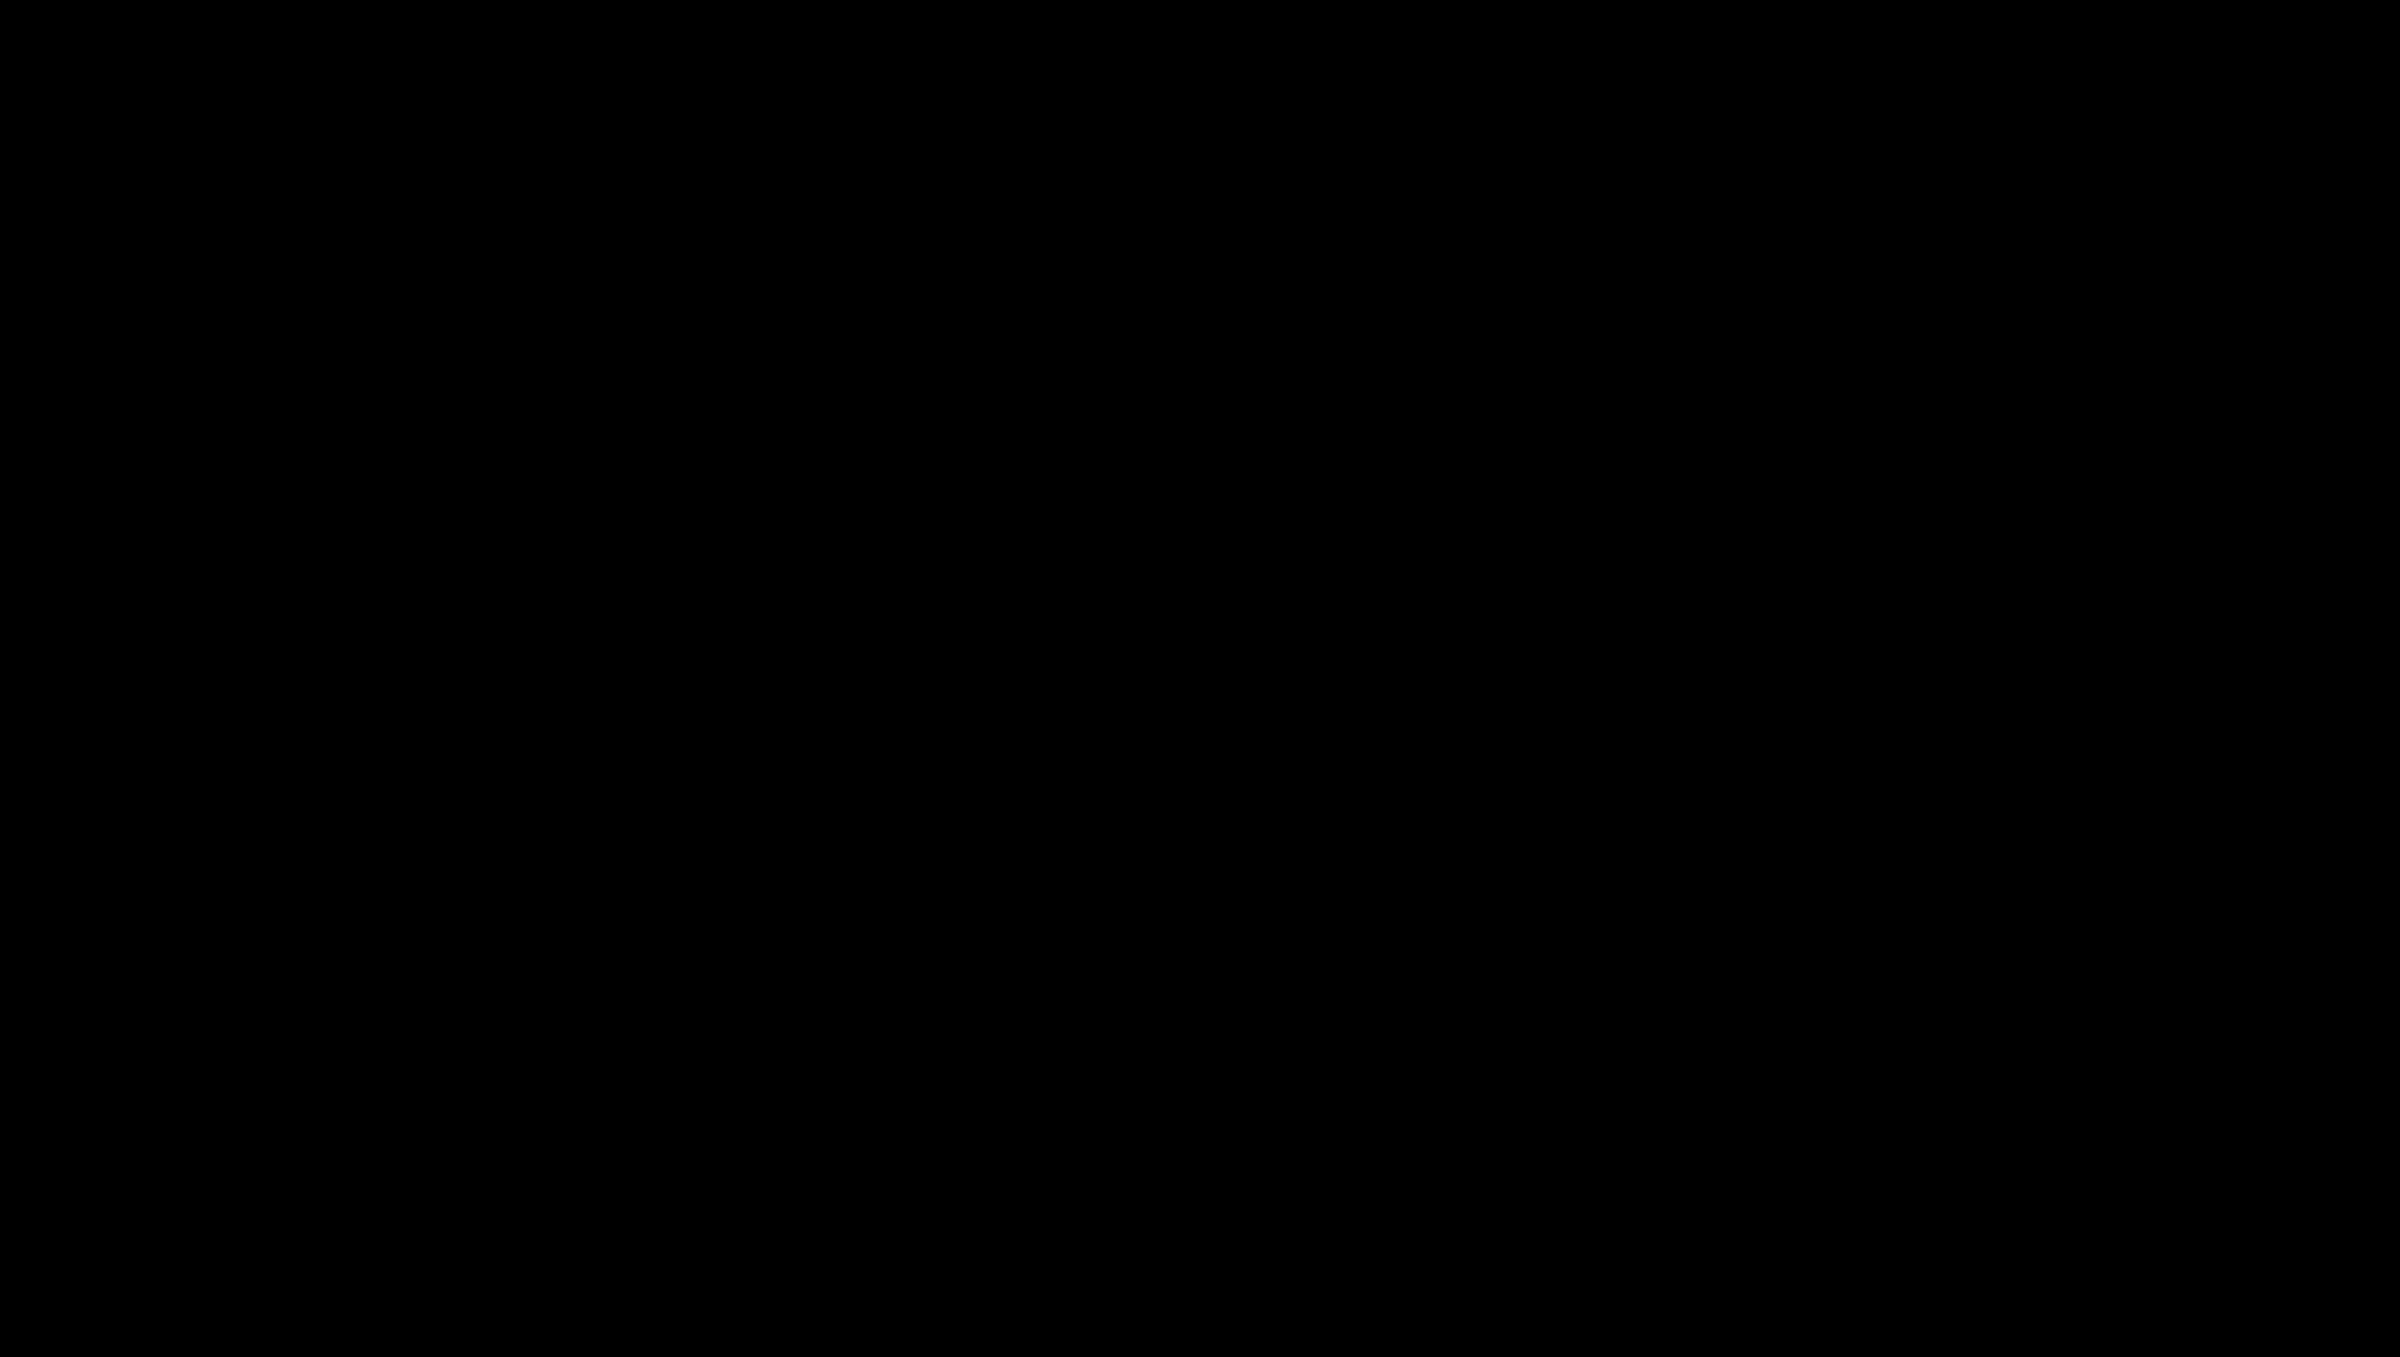 Apple barrel clipart black and white graphic freeuse Clipart - Lever Barrel Press graphic freeuse